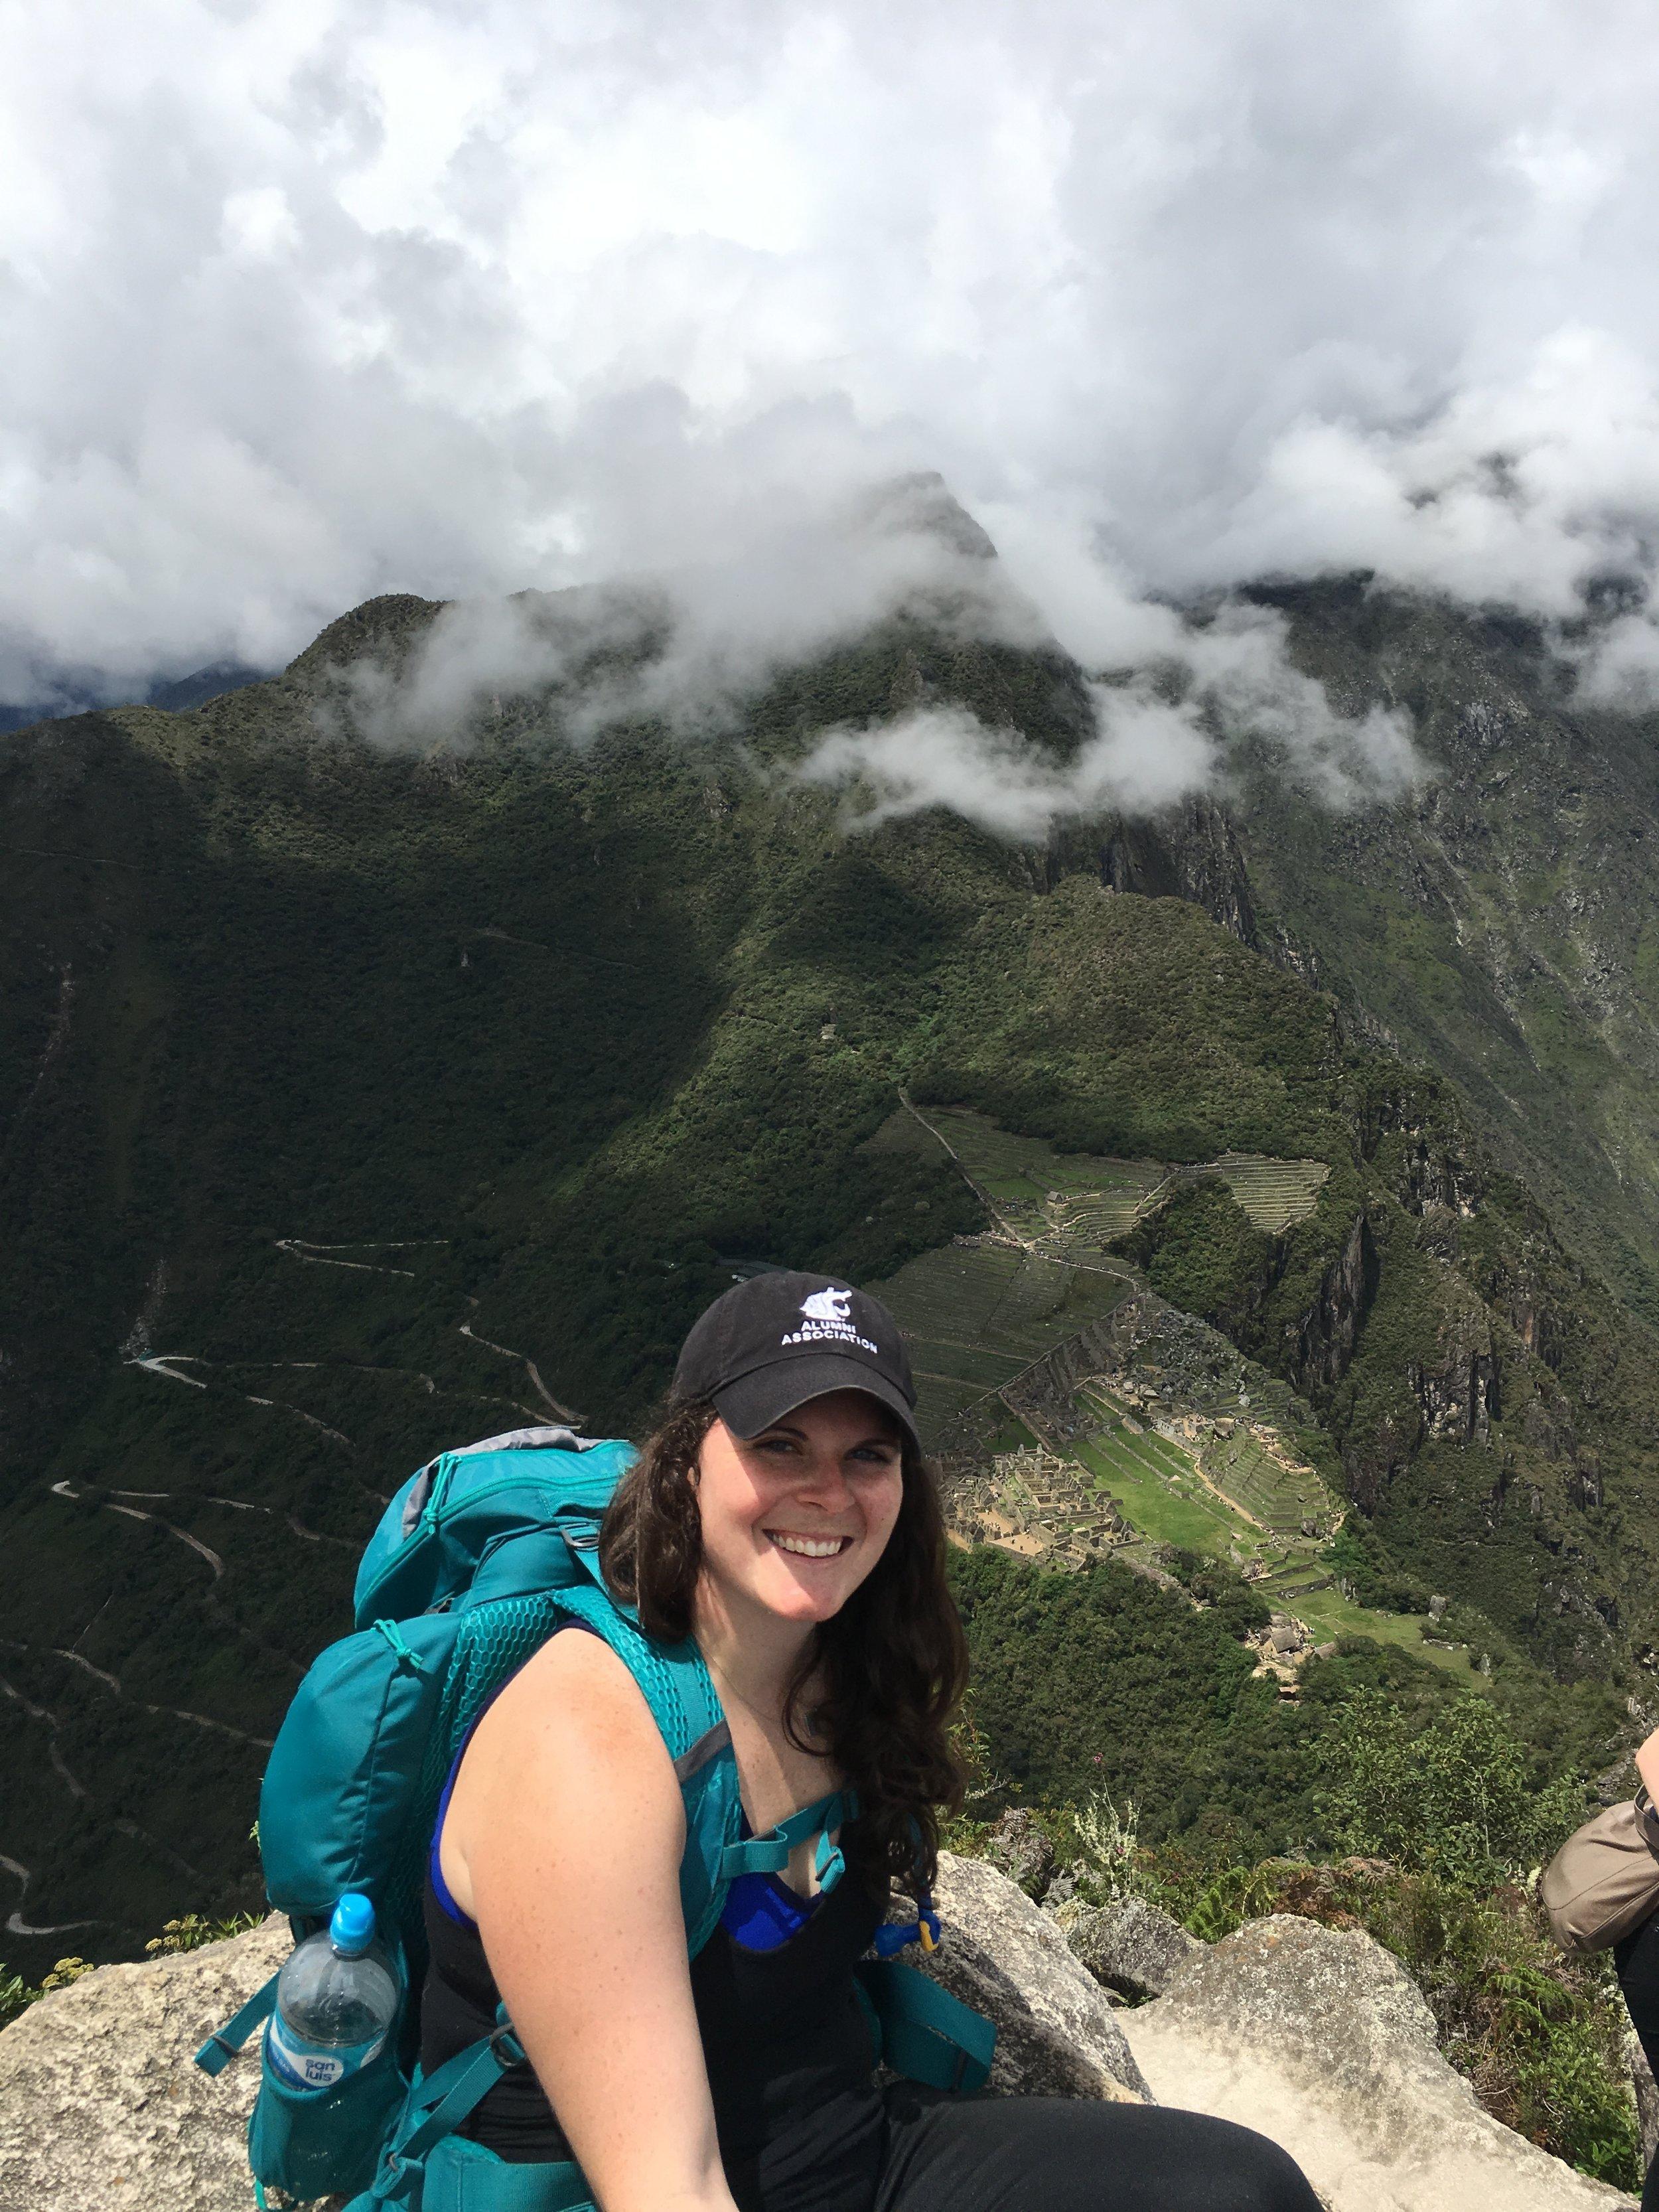 View from the top of Wayna Picchu back down toward Machu Picchu.